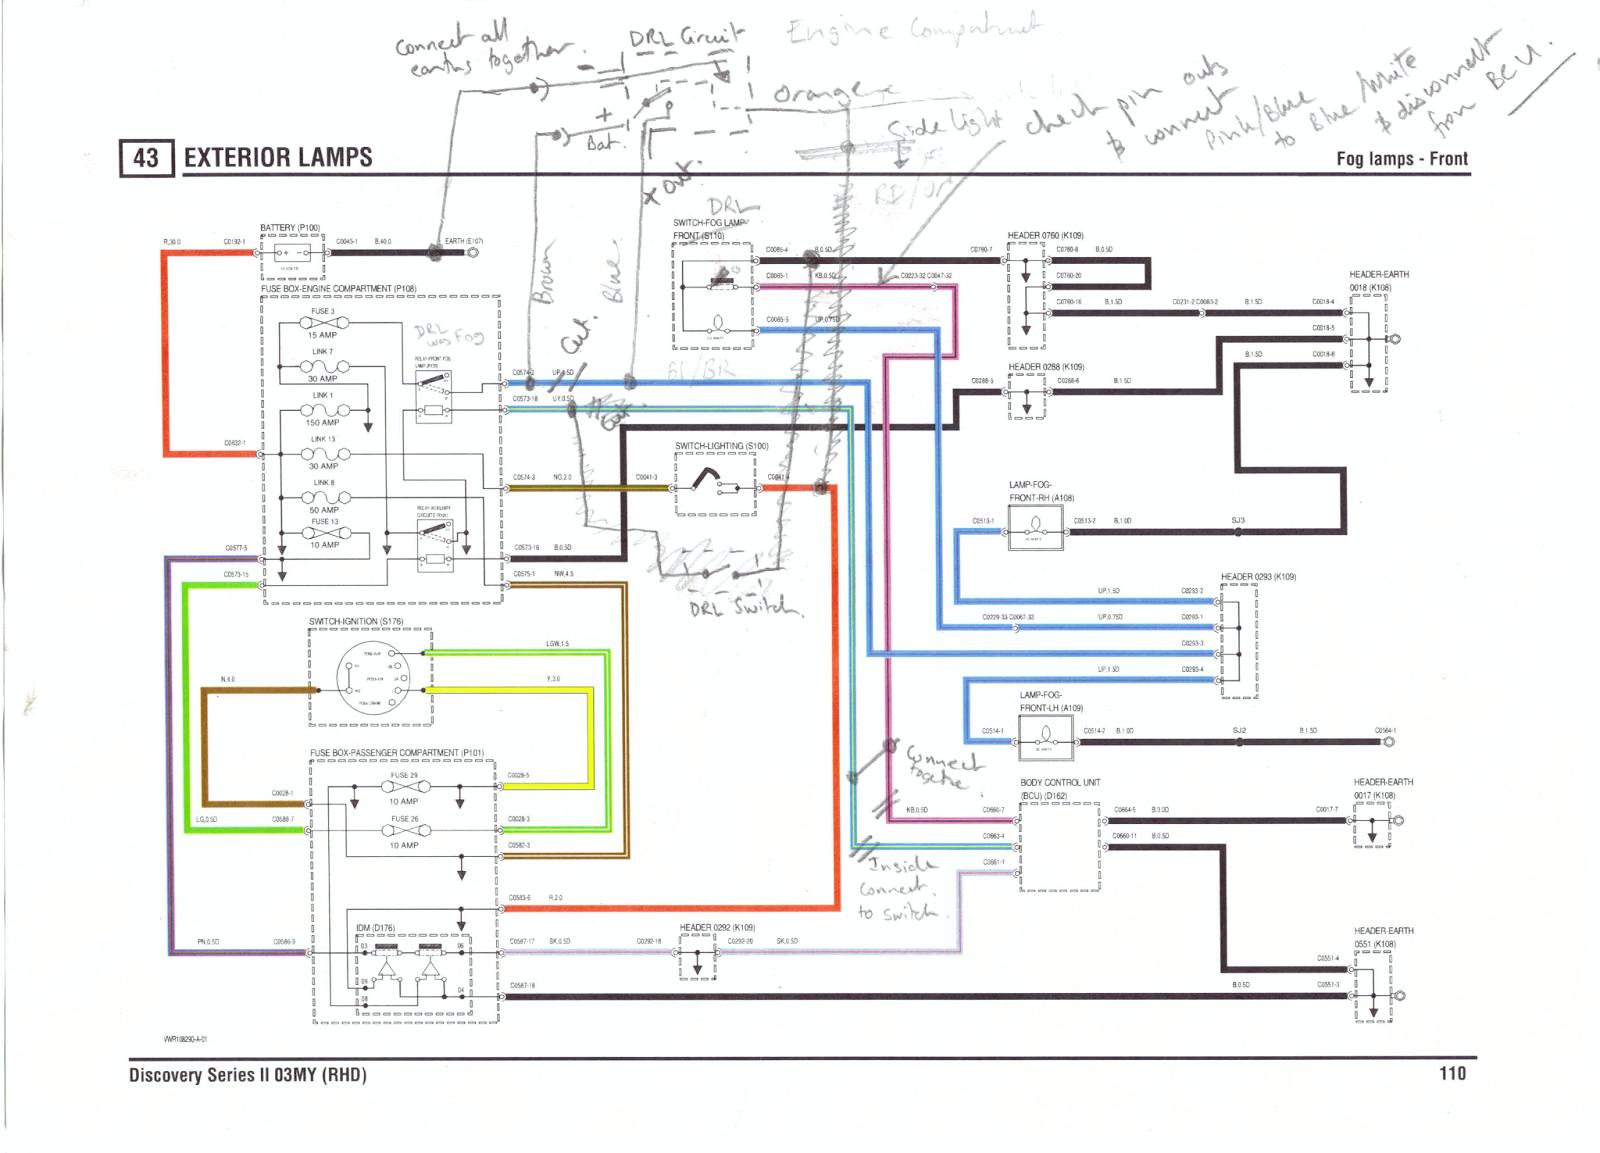 defender 90 wiring diagrams defender 90 wiring diagrams wiring diagram data  defender 90 wiring diagrams wiring